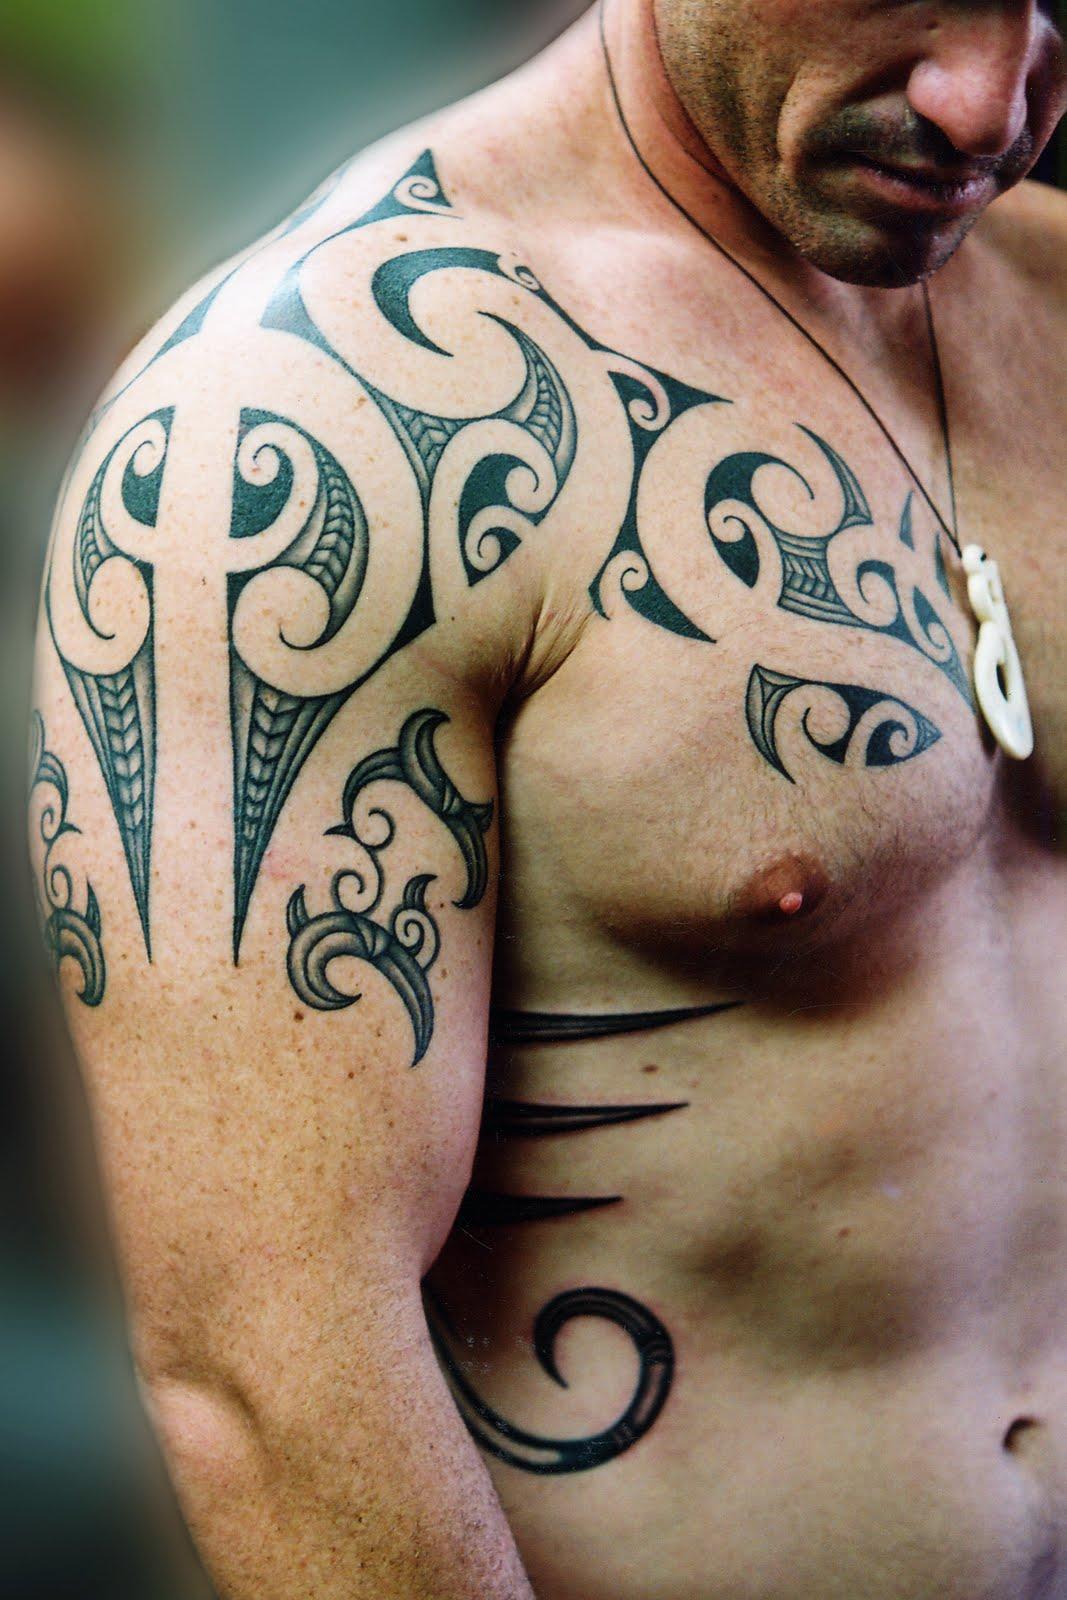 Top 10 fantastic best tattoo design ideas for 2015